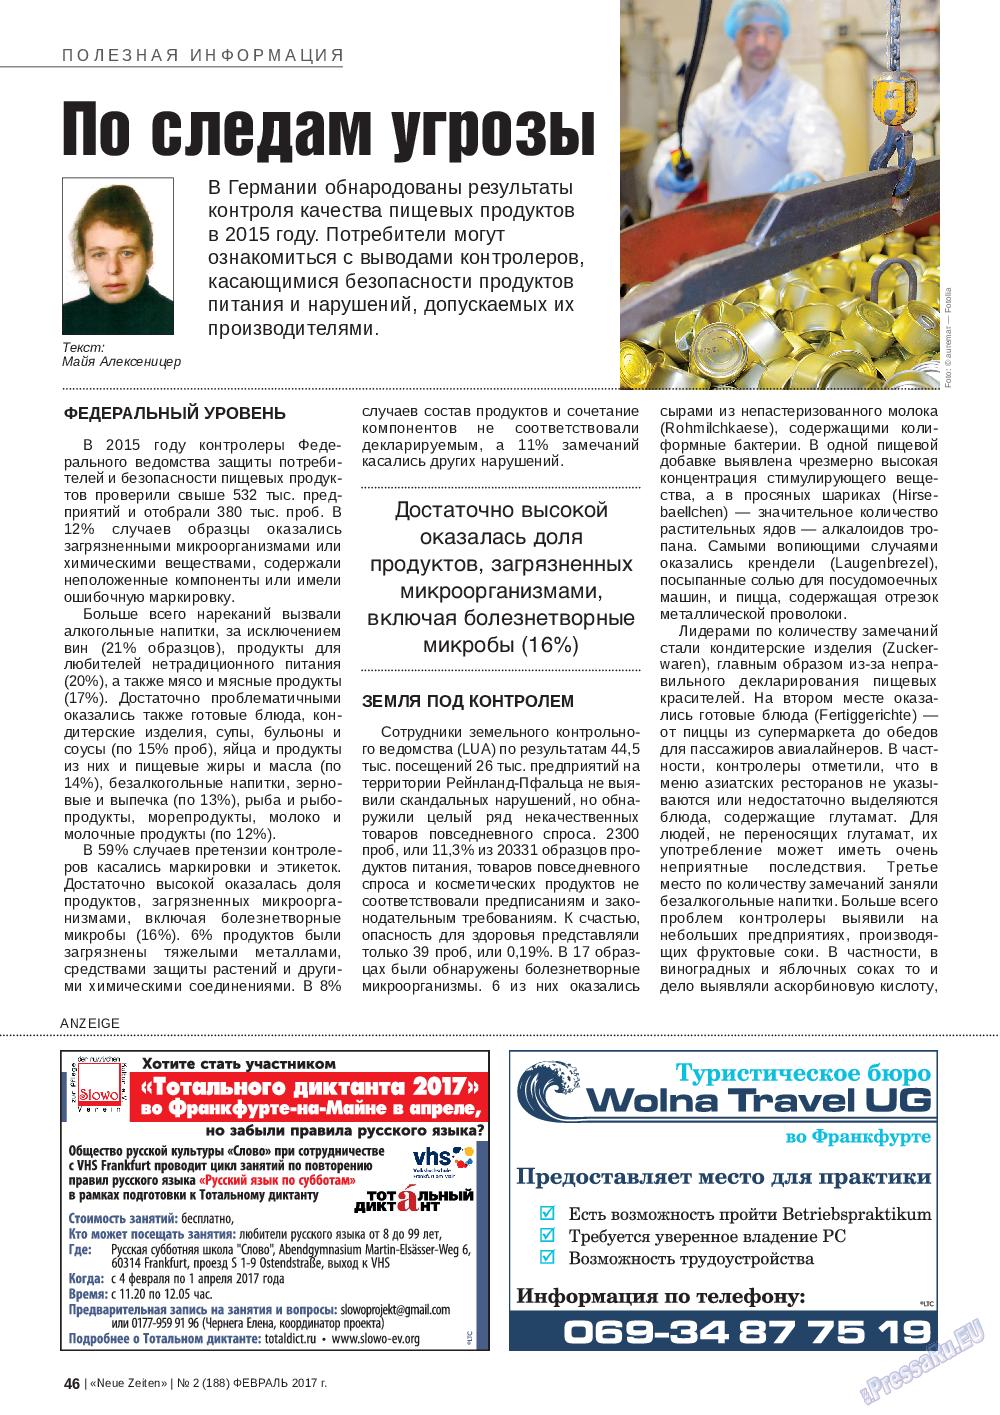 Neue Zeiten (журнал). 2017 год, номер 2, стр. 46